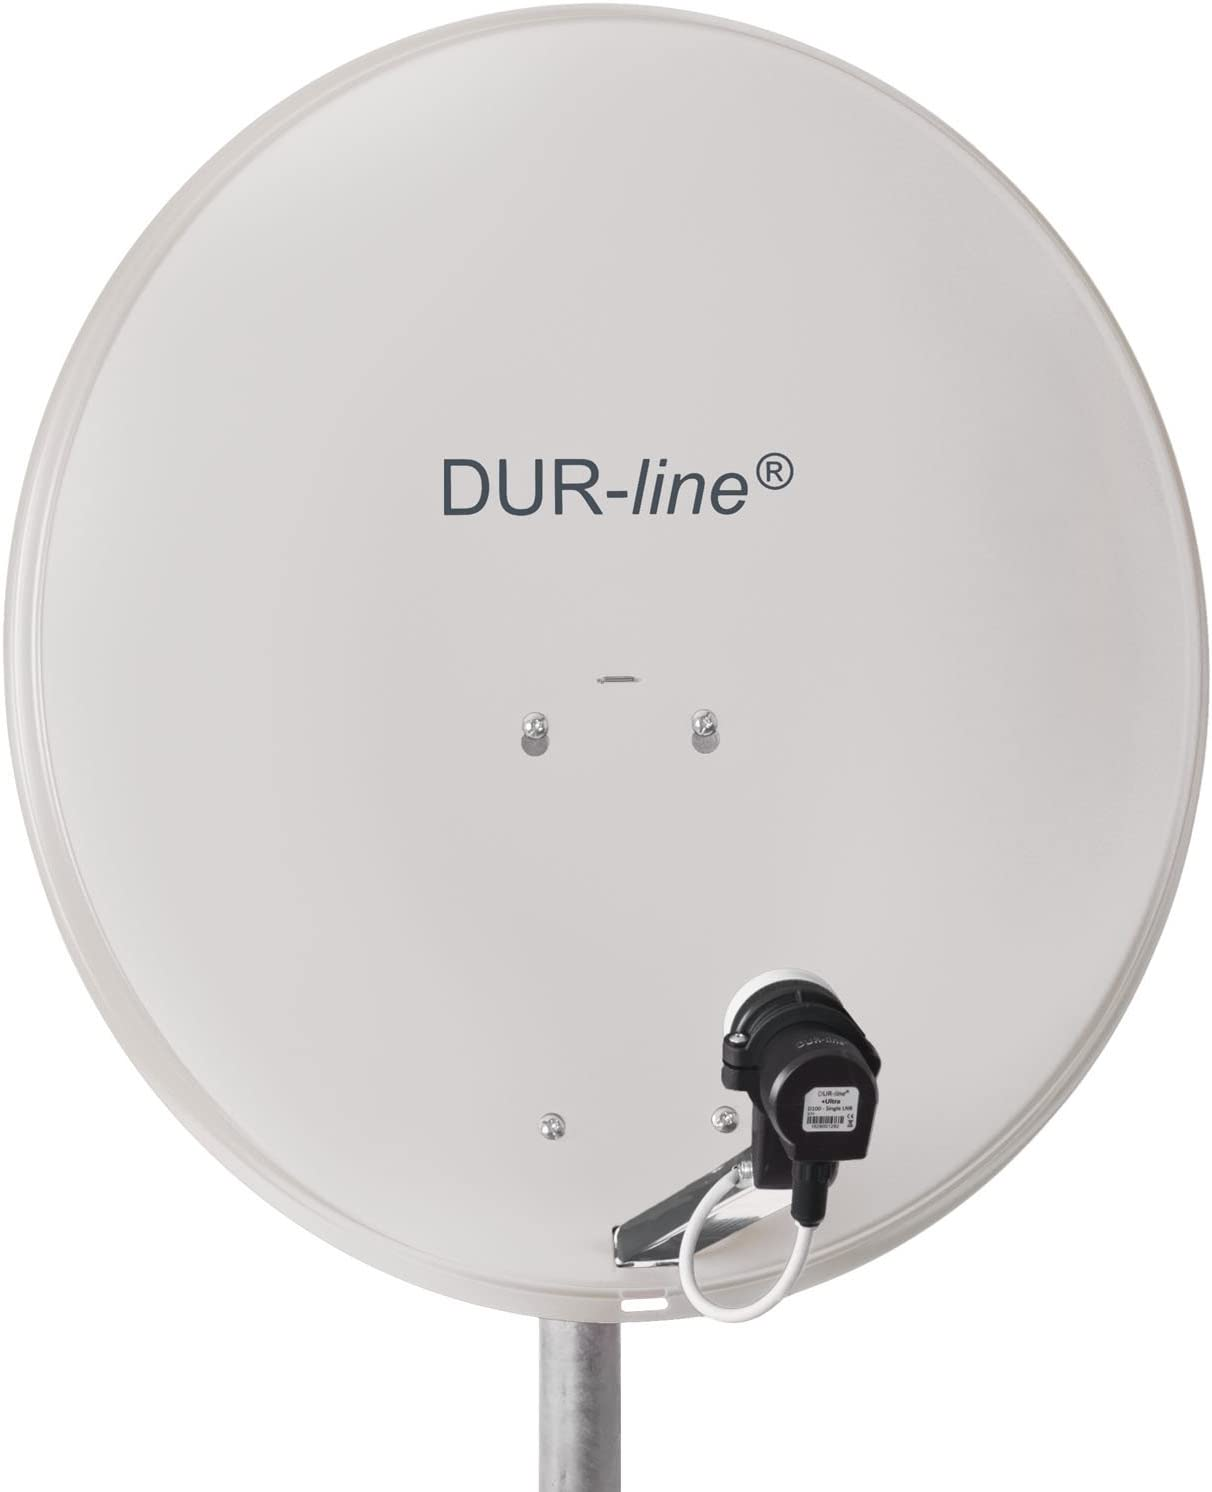 DUR-line MDA - Antena parabólica de aluminio con soporte LNB (60 cm, digital, camping, Astra 19,2°, DVB-S/S2, Full HD, 4K, 3D), color gris claro